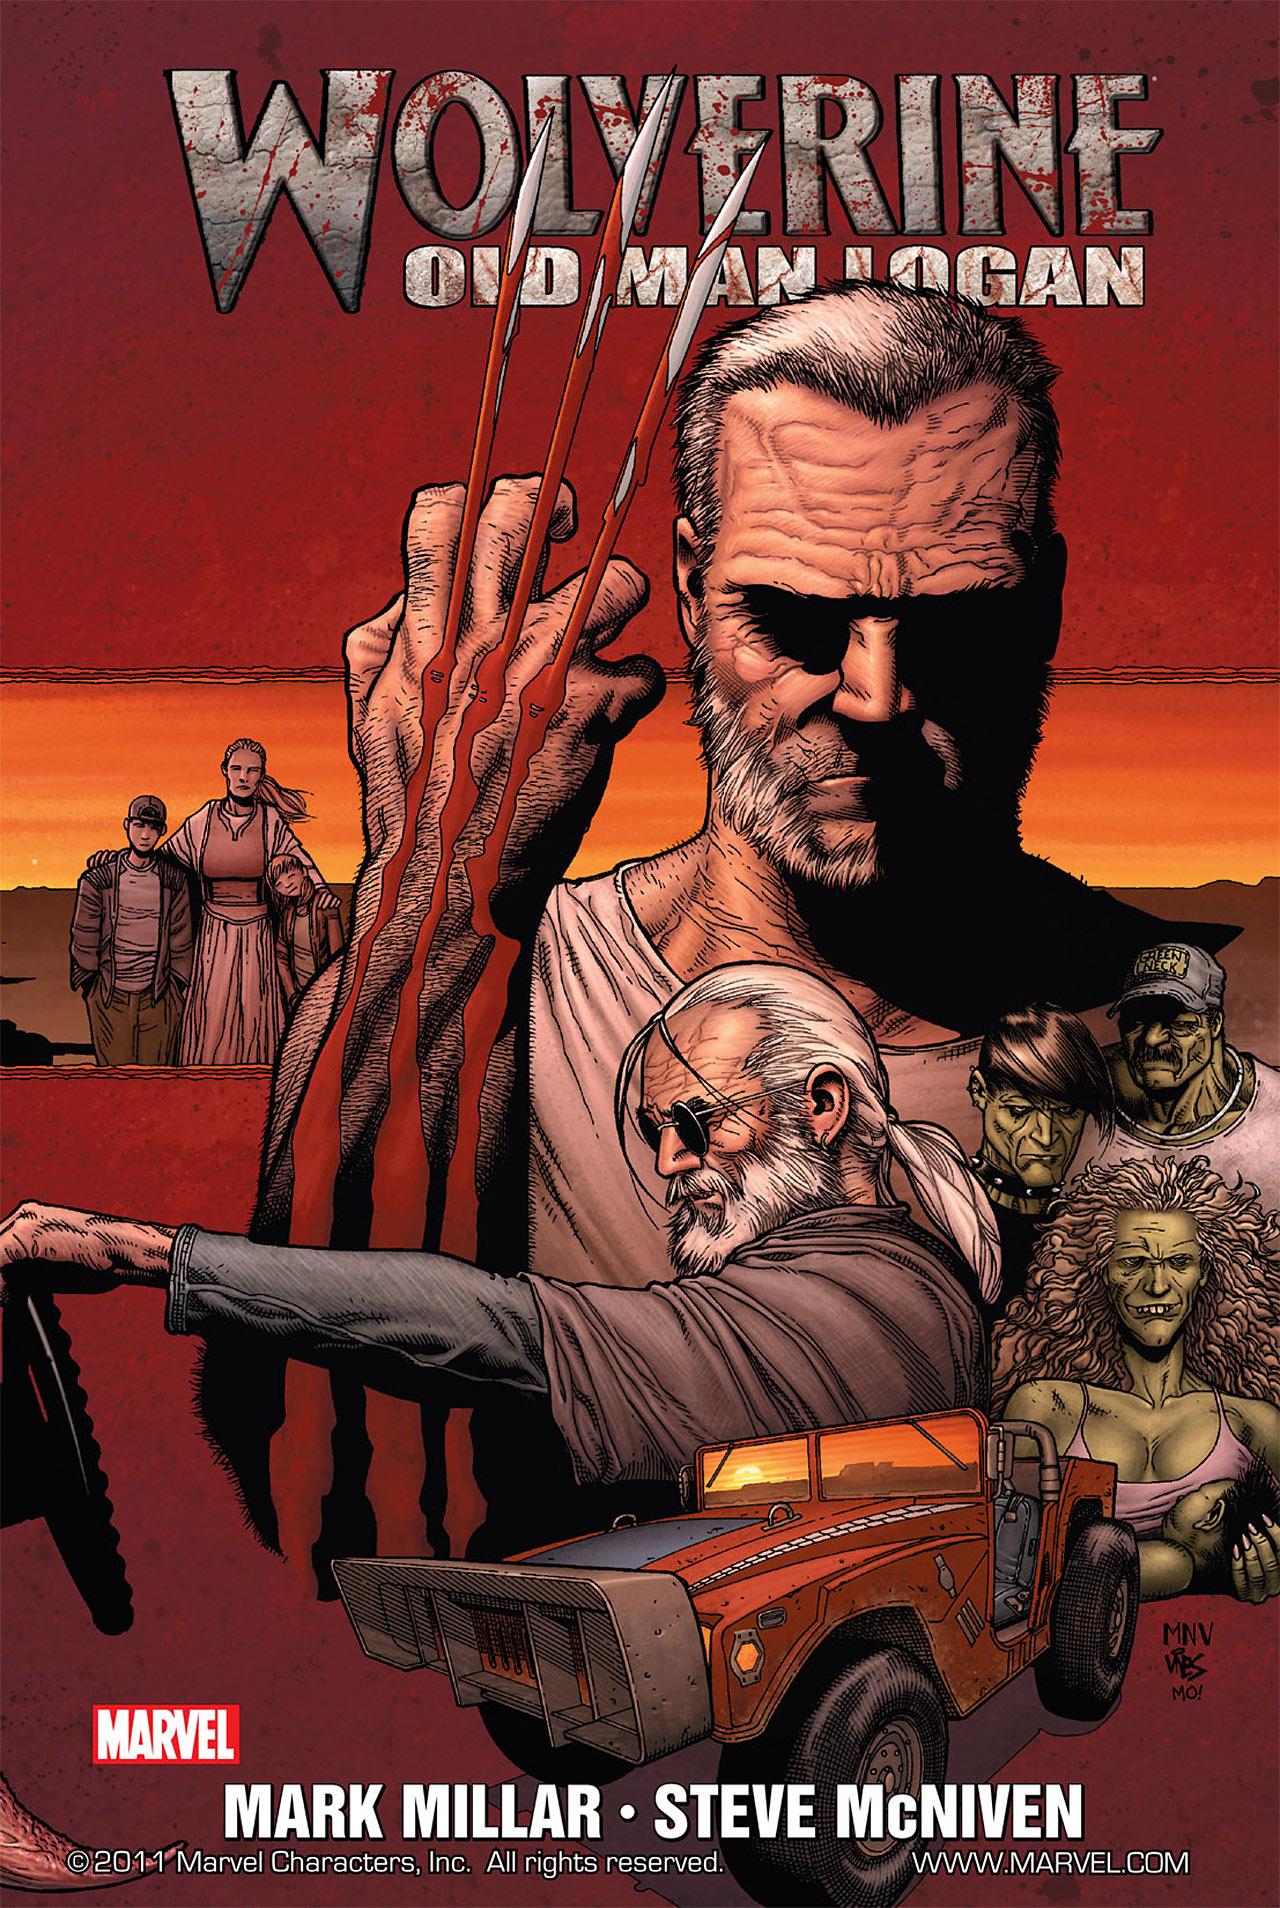 Read online Wolverine: Old Man Logan comic -  Issue # Full - 2